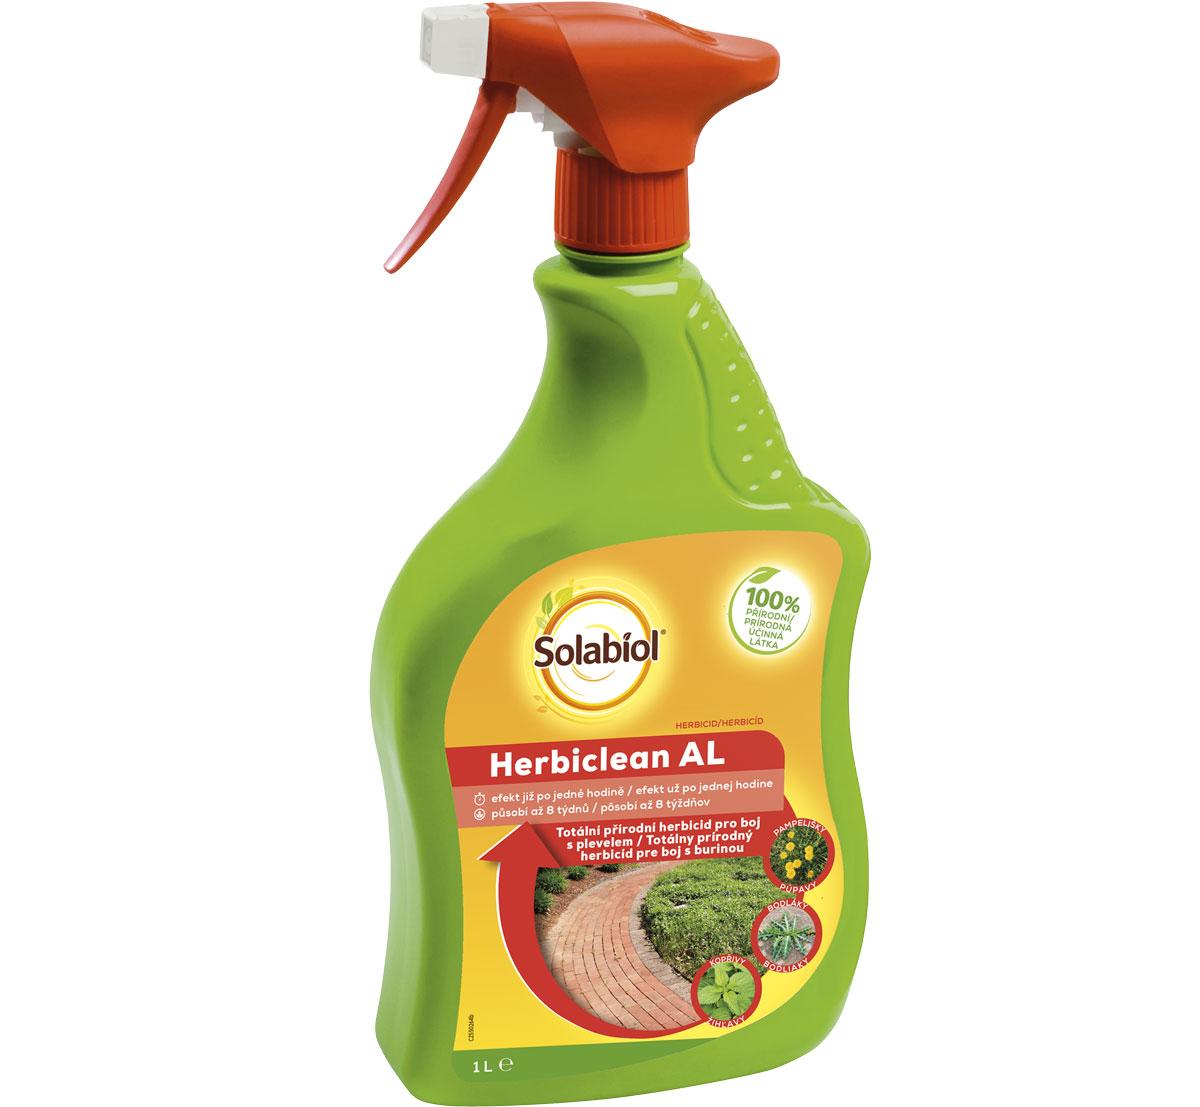 soutěž o zahradní chemii: Herbiclean AL